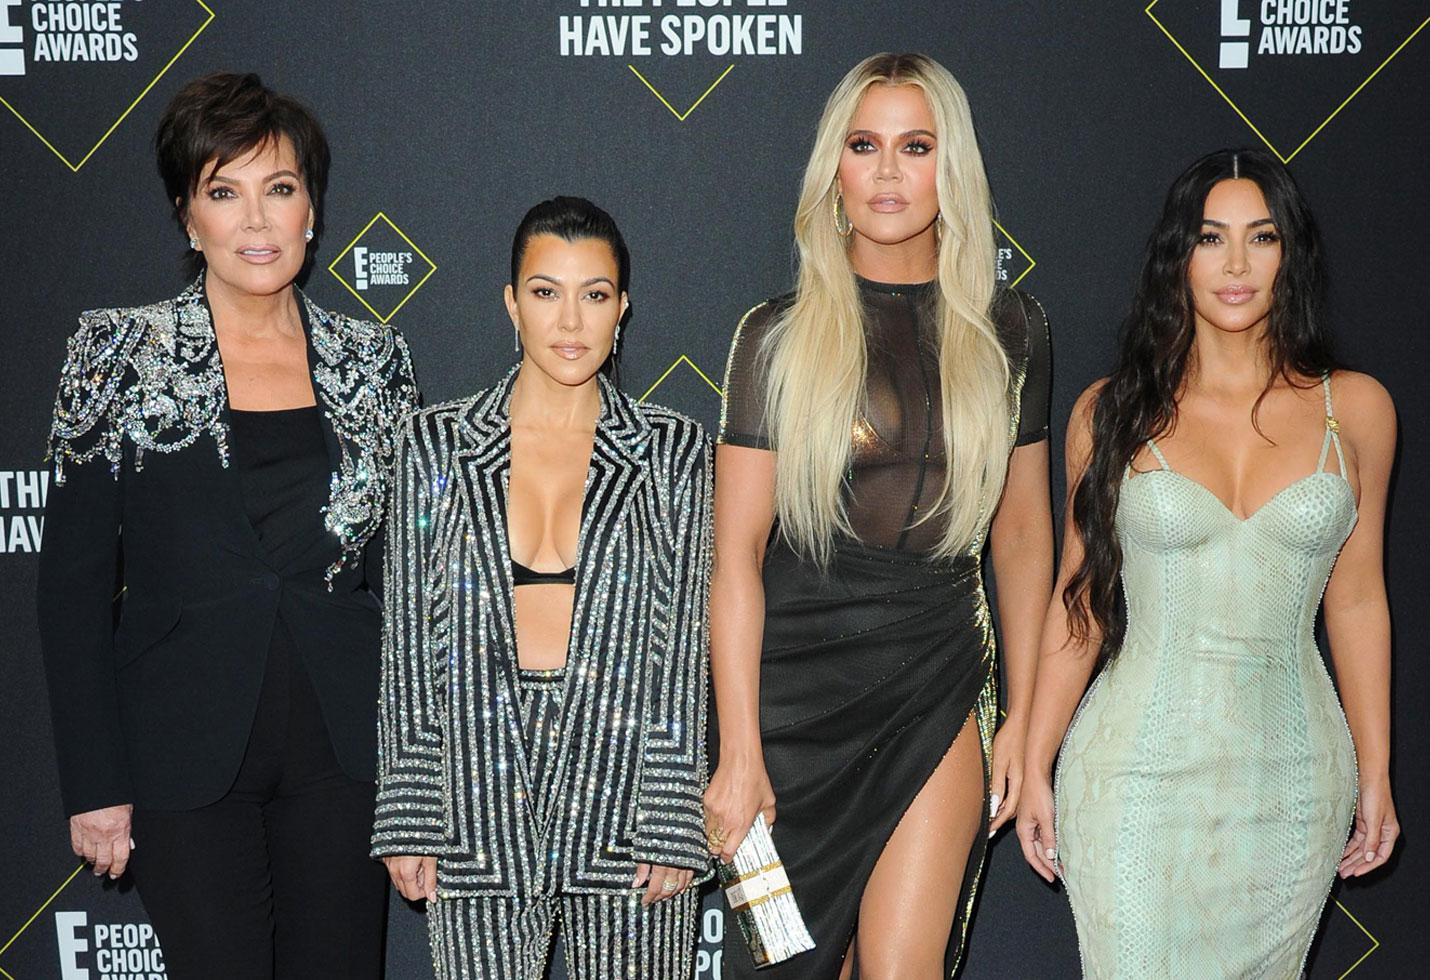 -PICTURED: Kris Jenner, Kourtney Kardashian, Khloe Kardashian, Kim Kardashian West